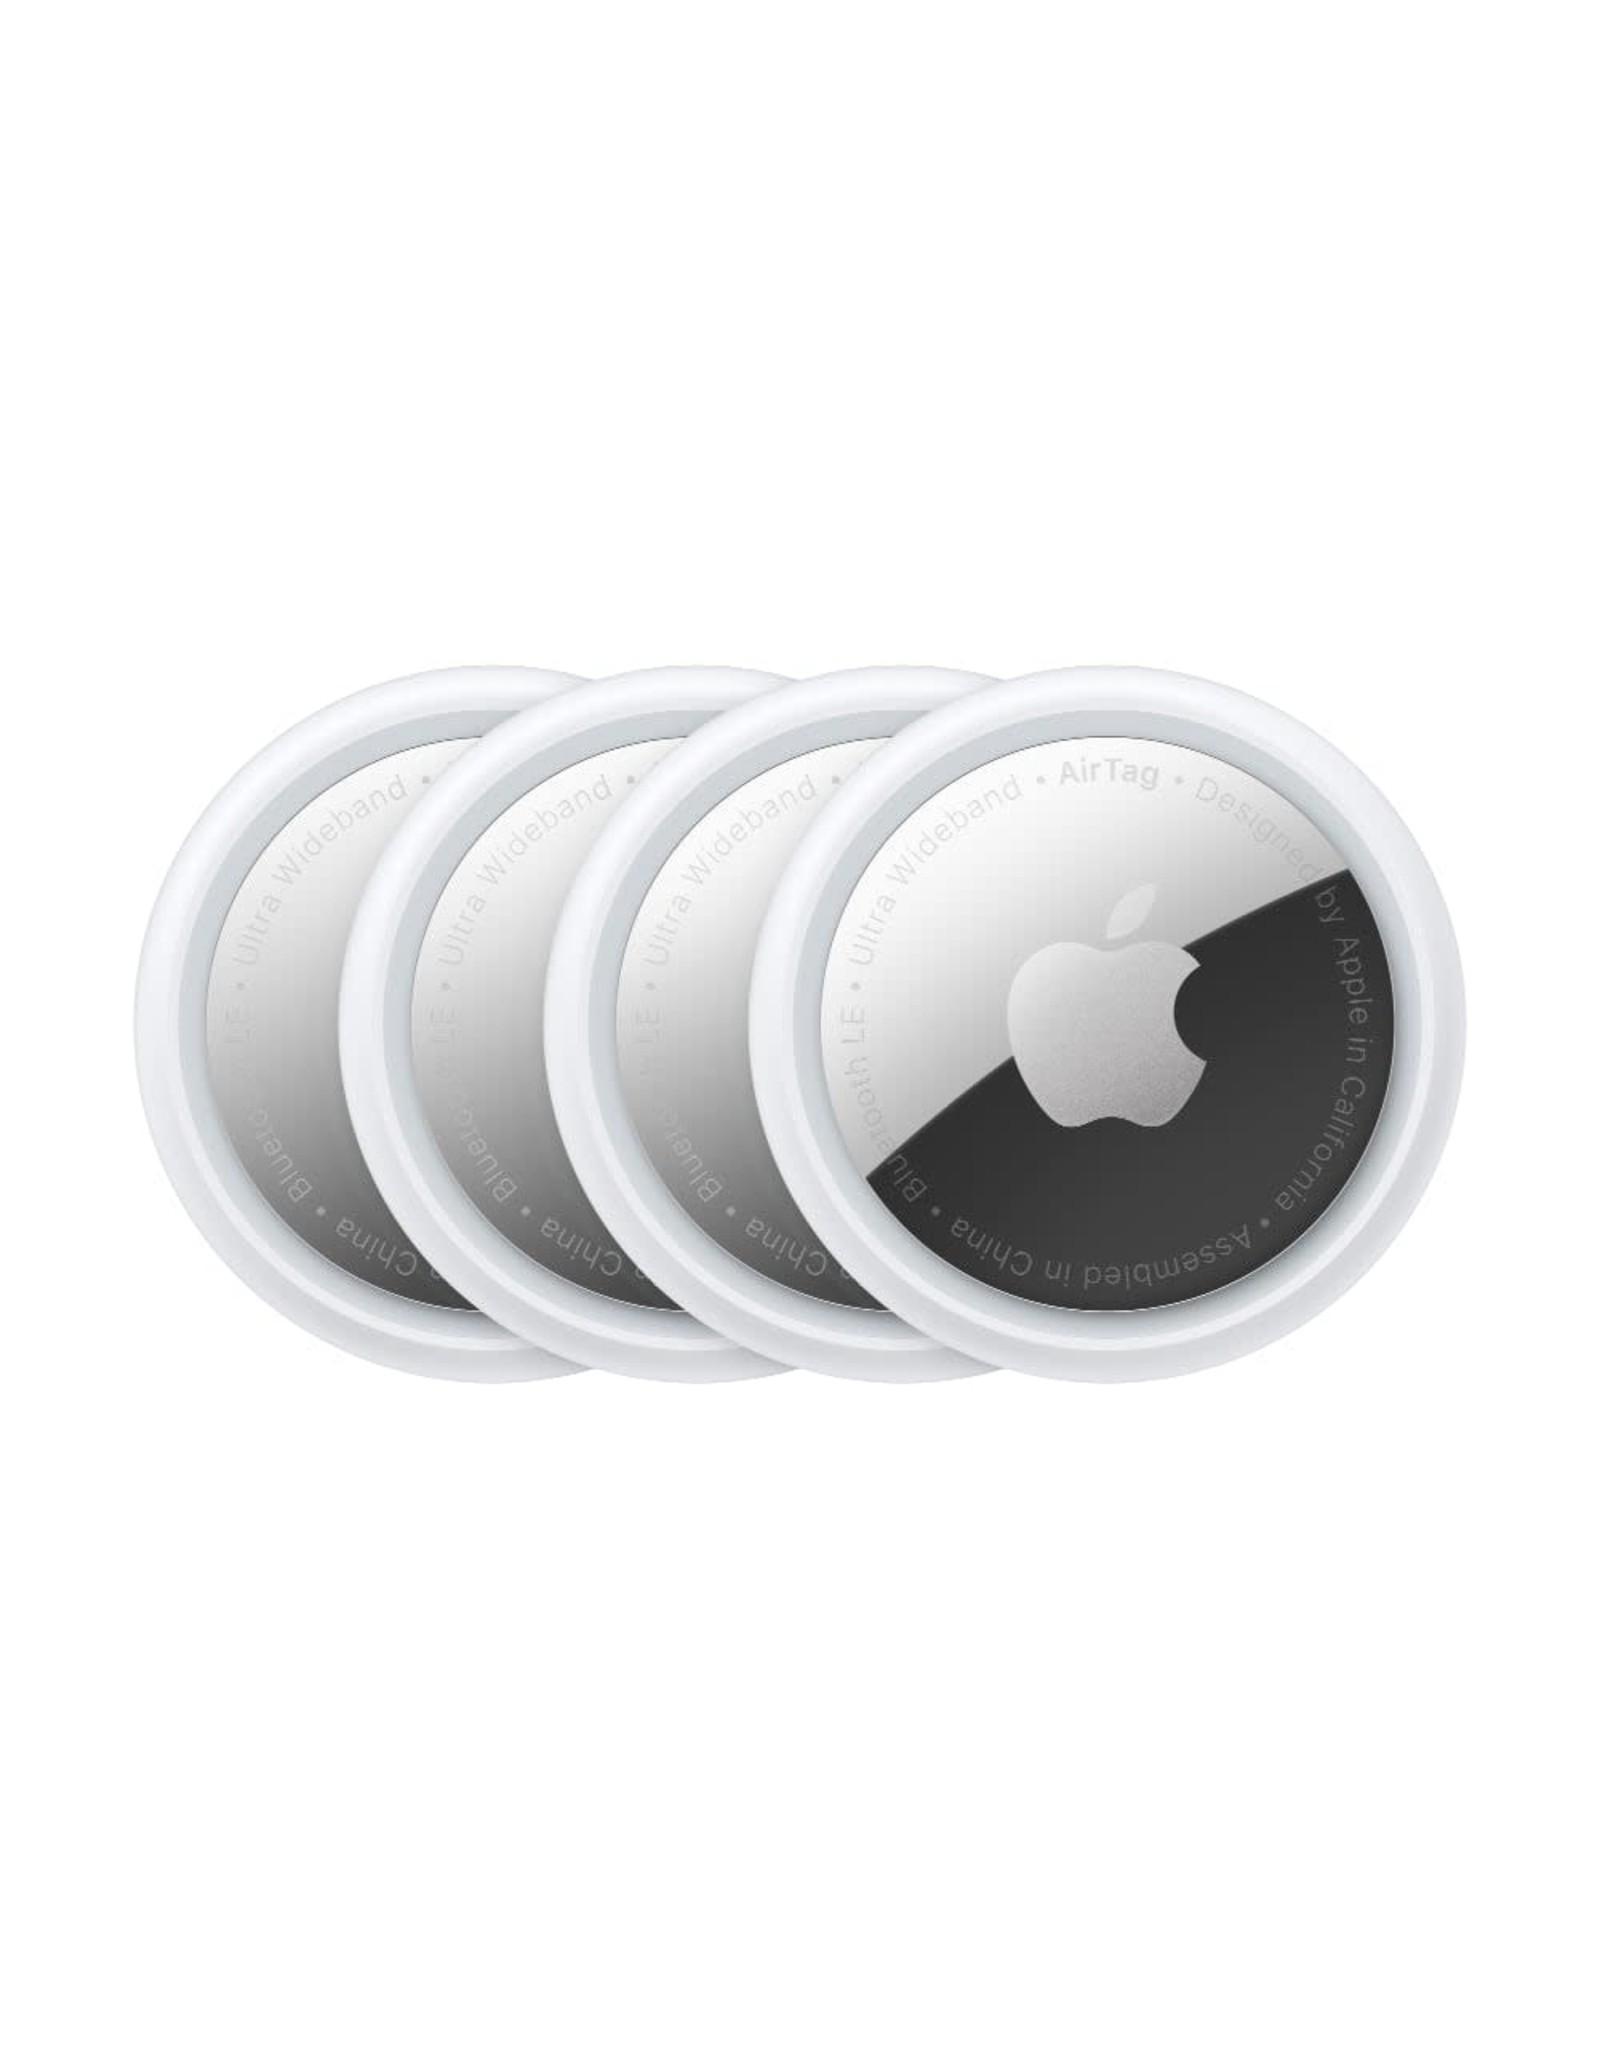 Apple Apple AirTag - 4 pack